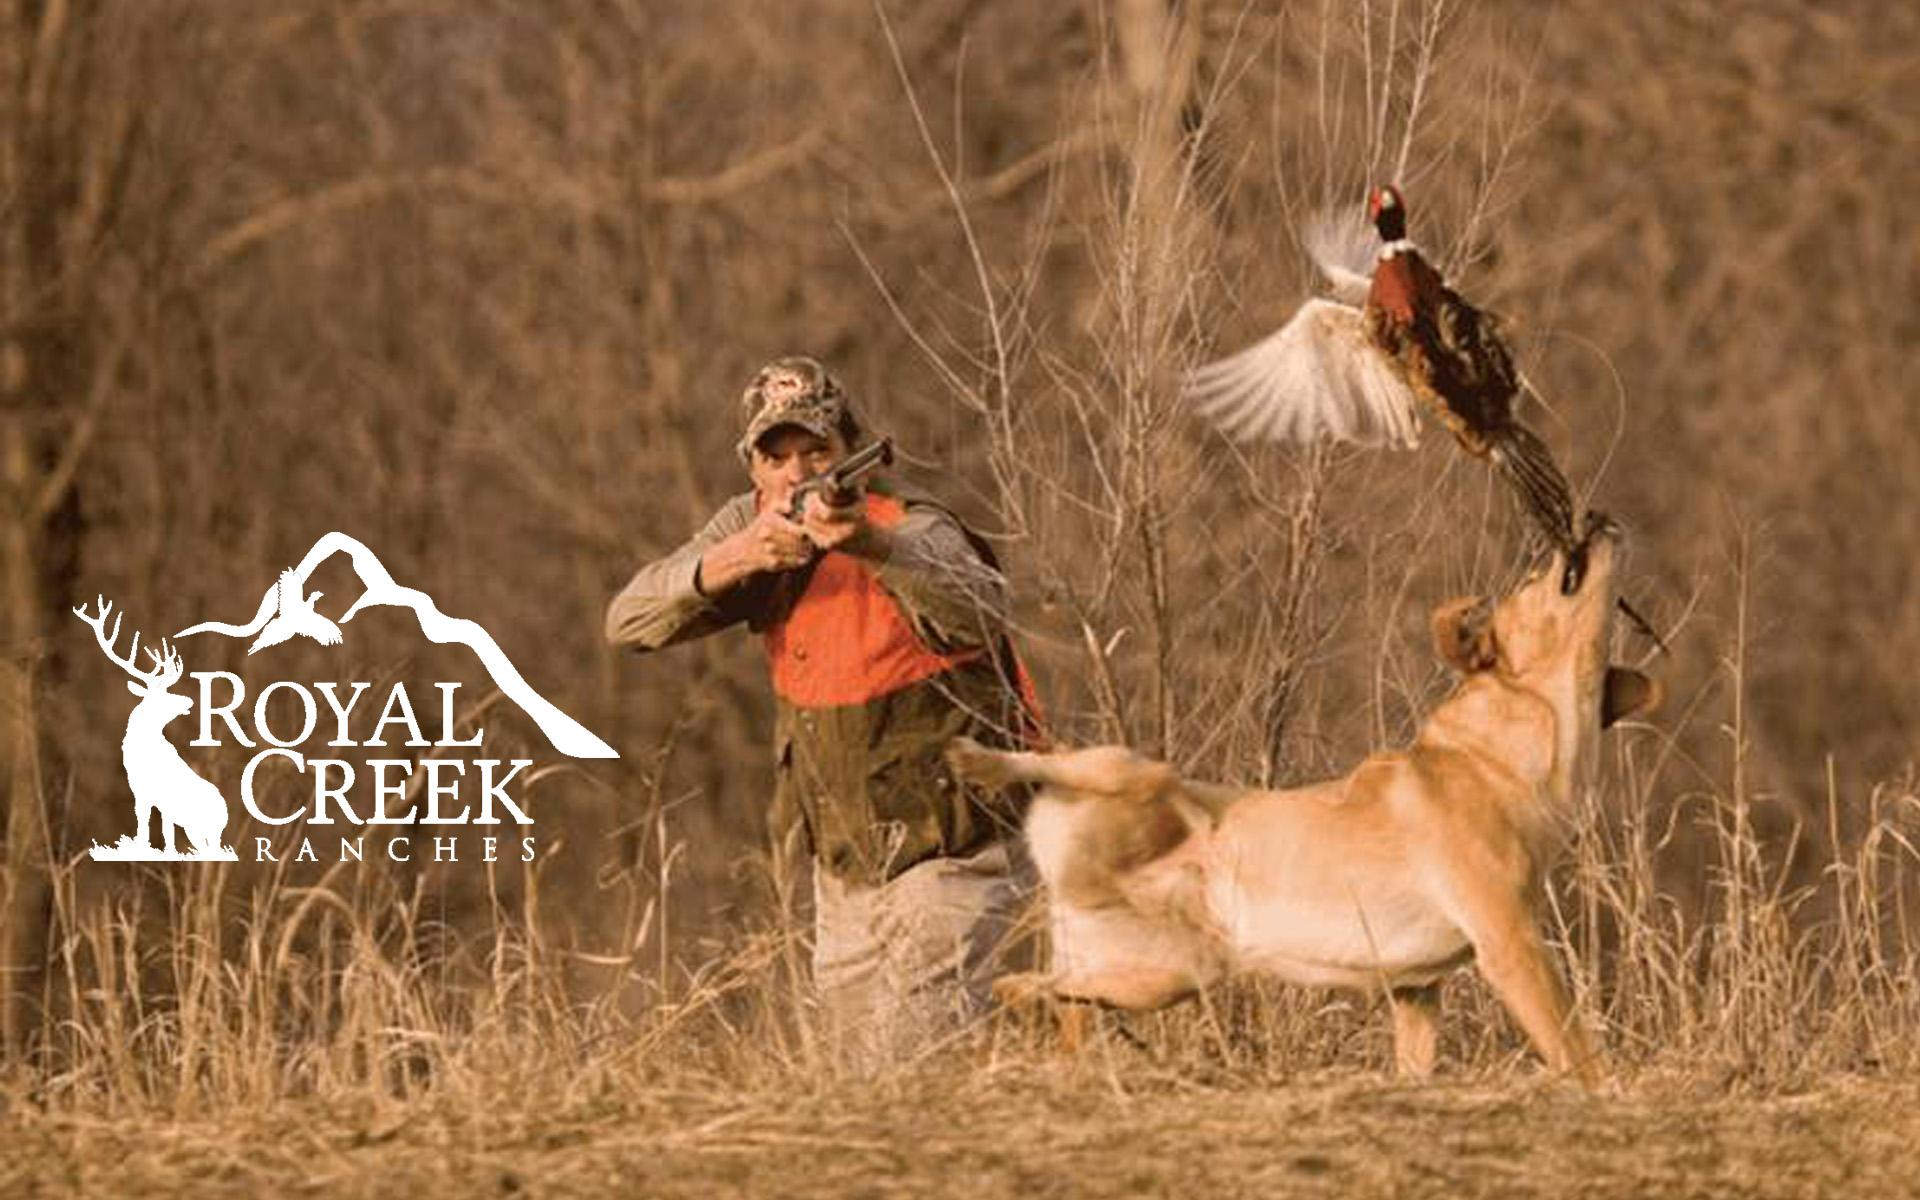 Elk and Pheasant Hunting – Royal Creek Ranches